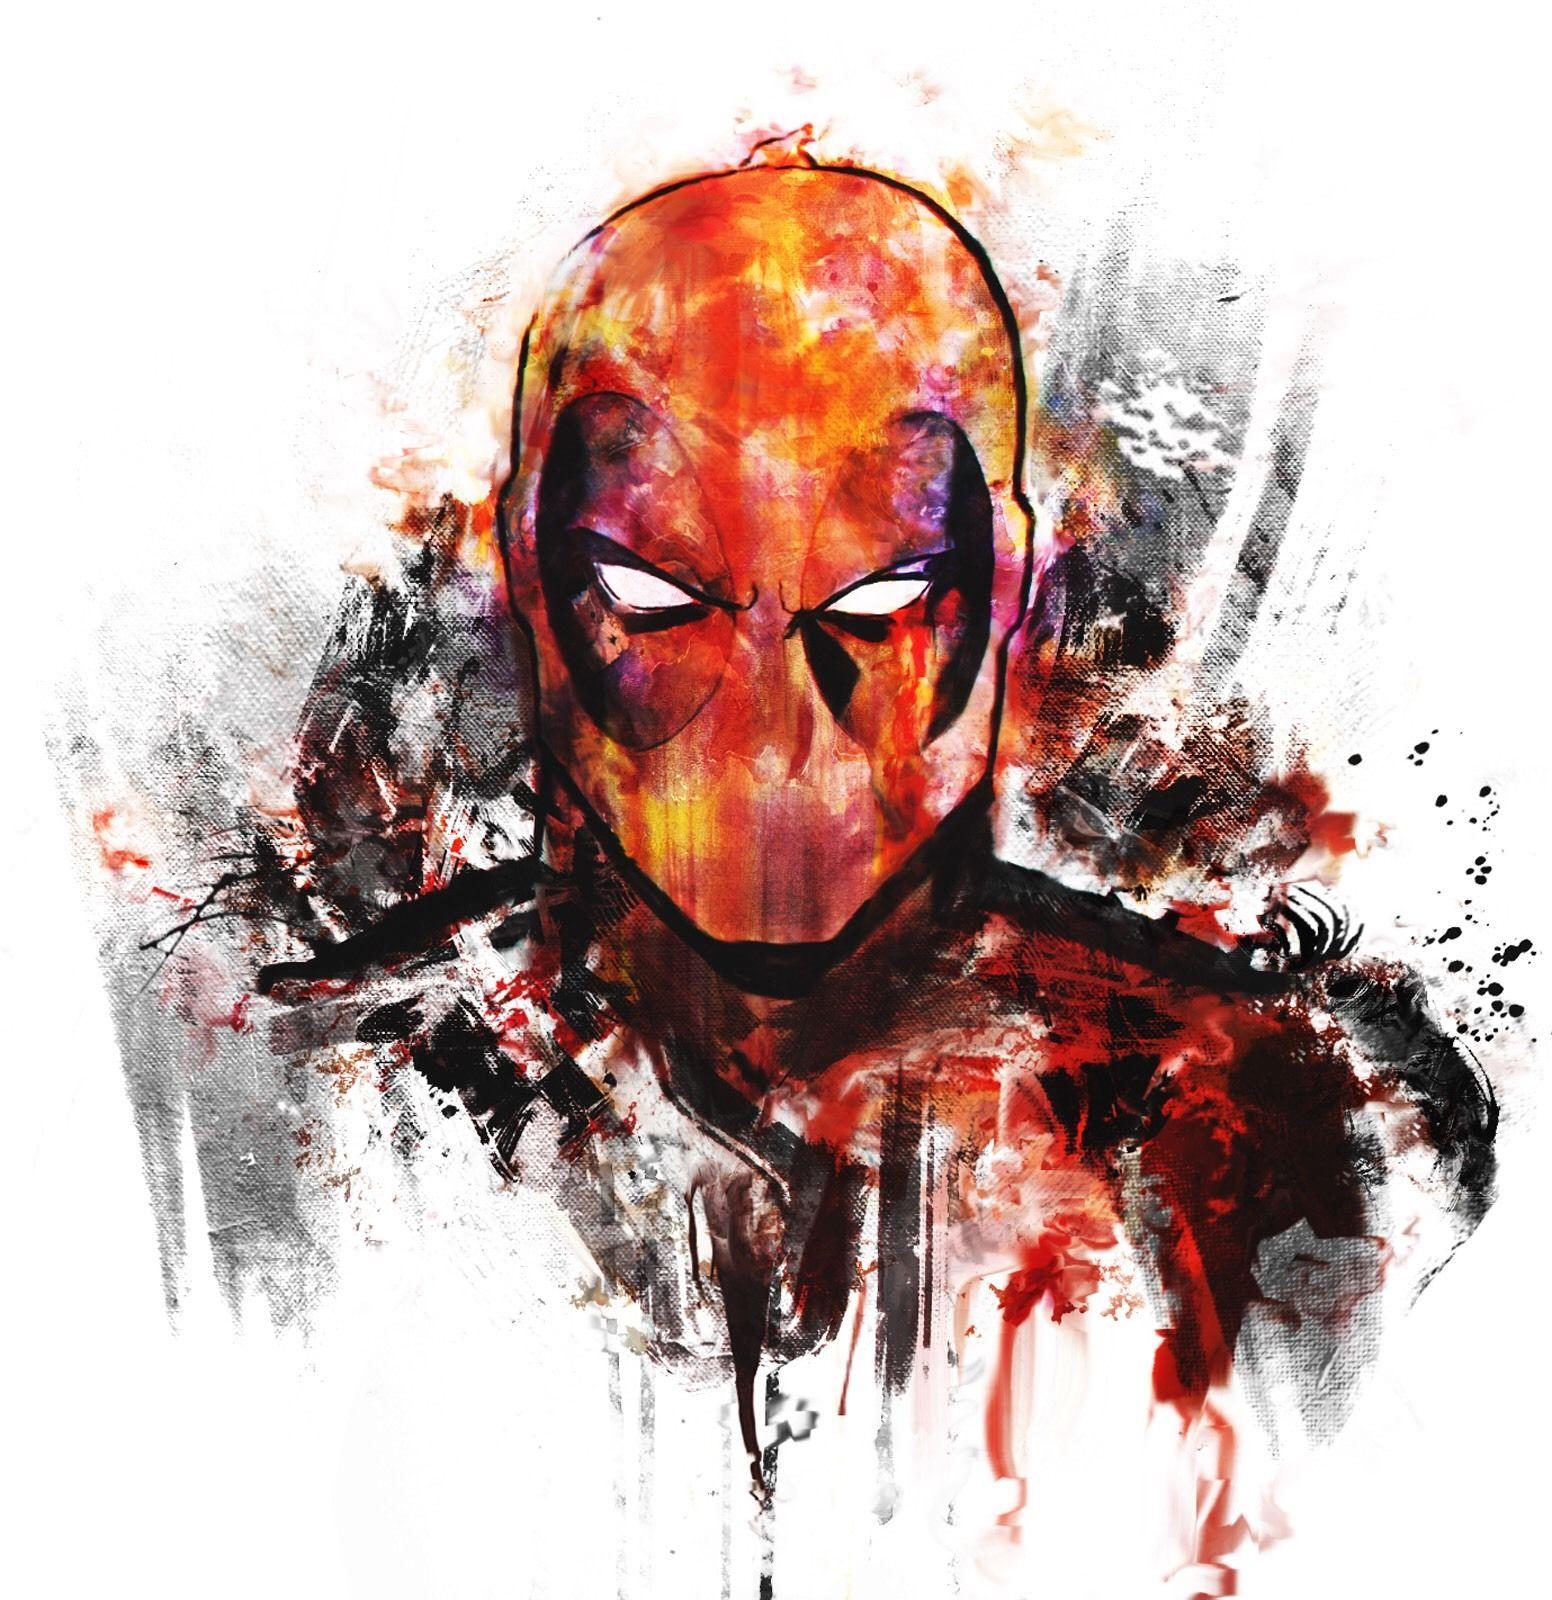 1552x1600 00117 Deadpool Marvel Art Watercolor Image Poster Print Ebay